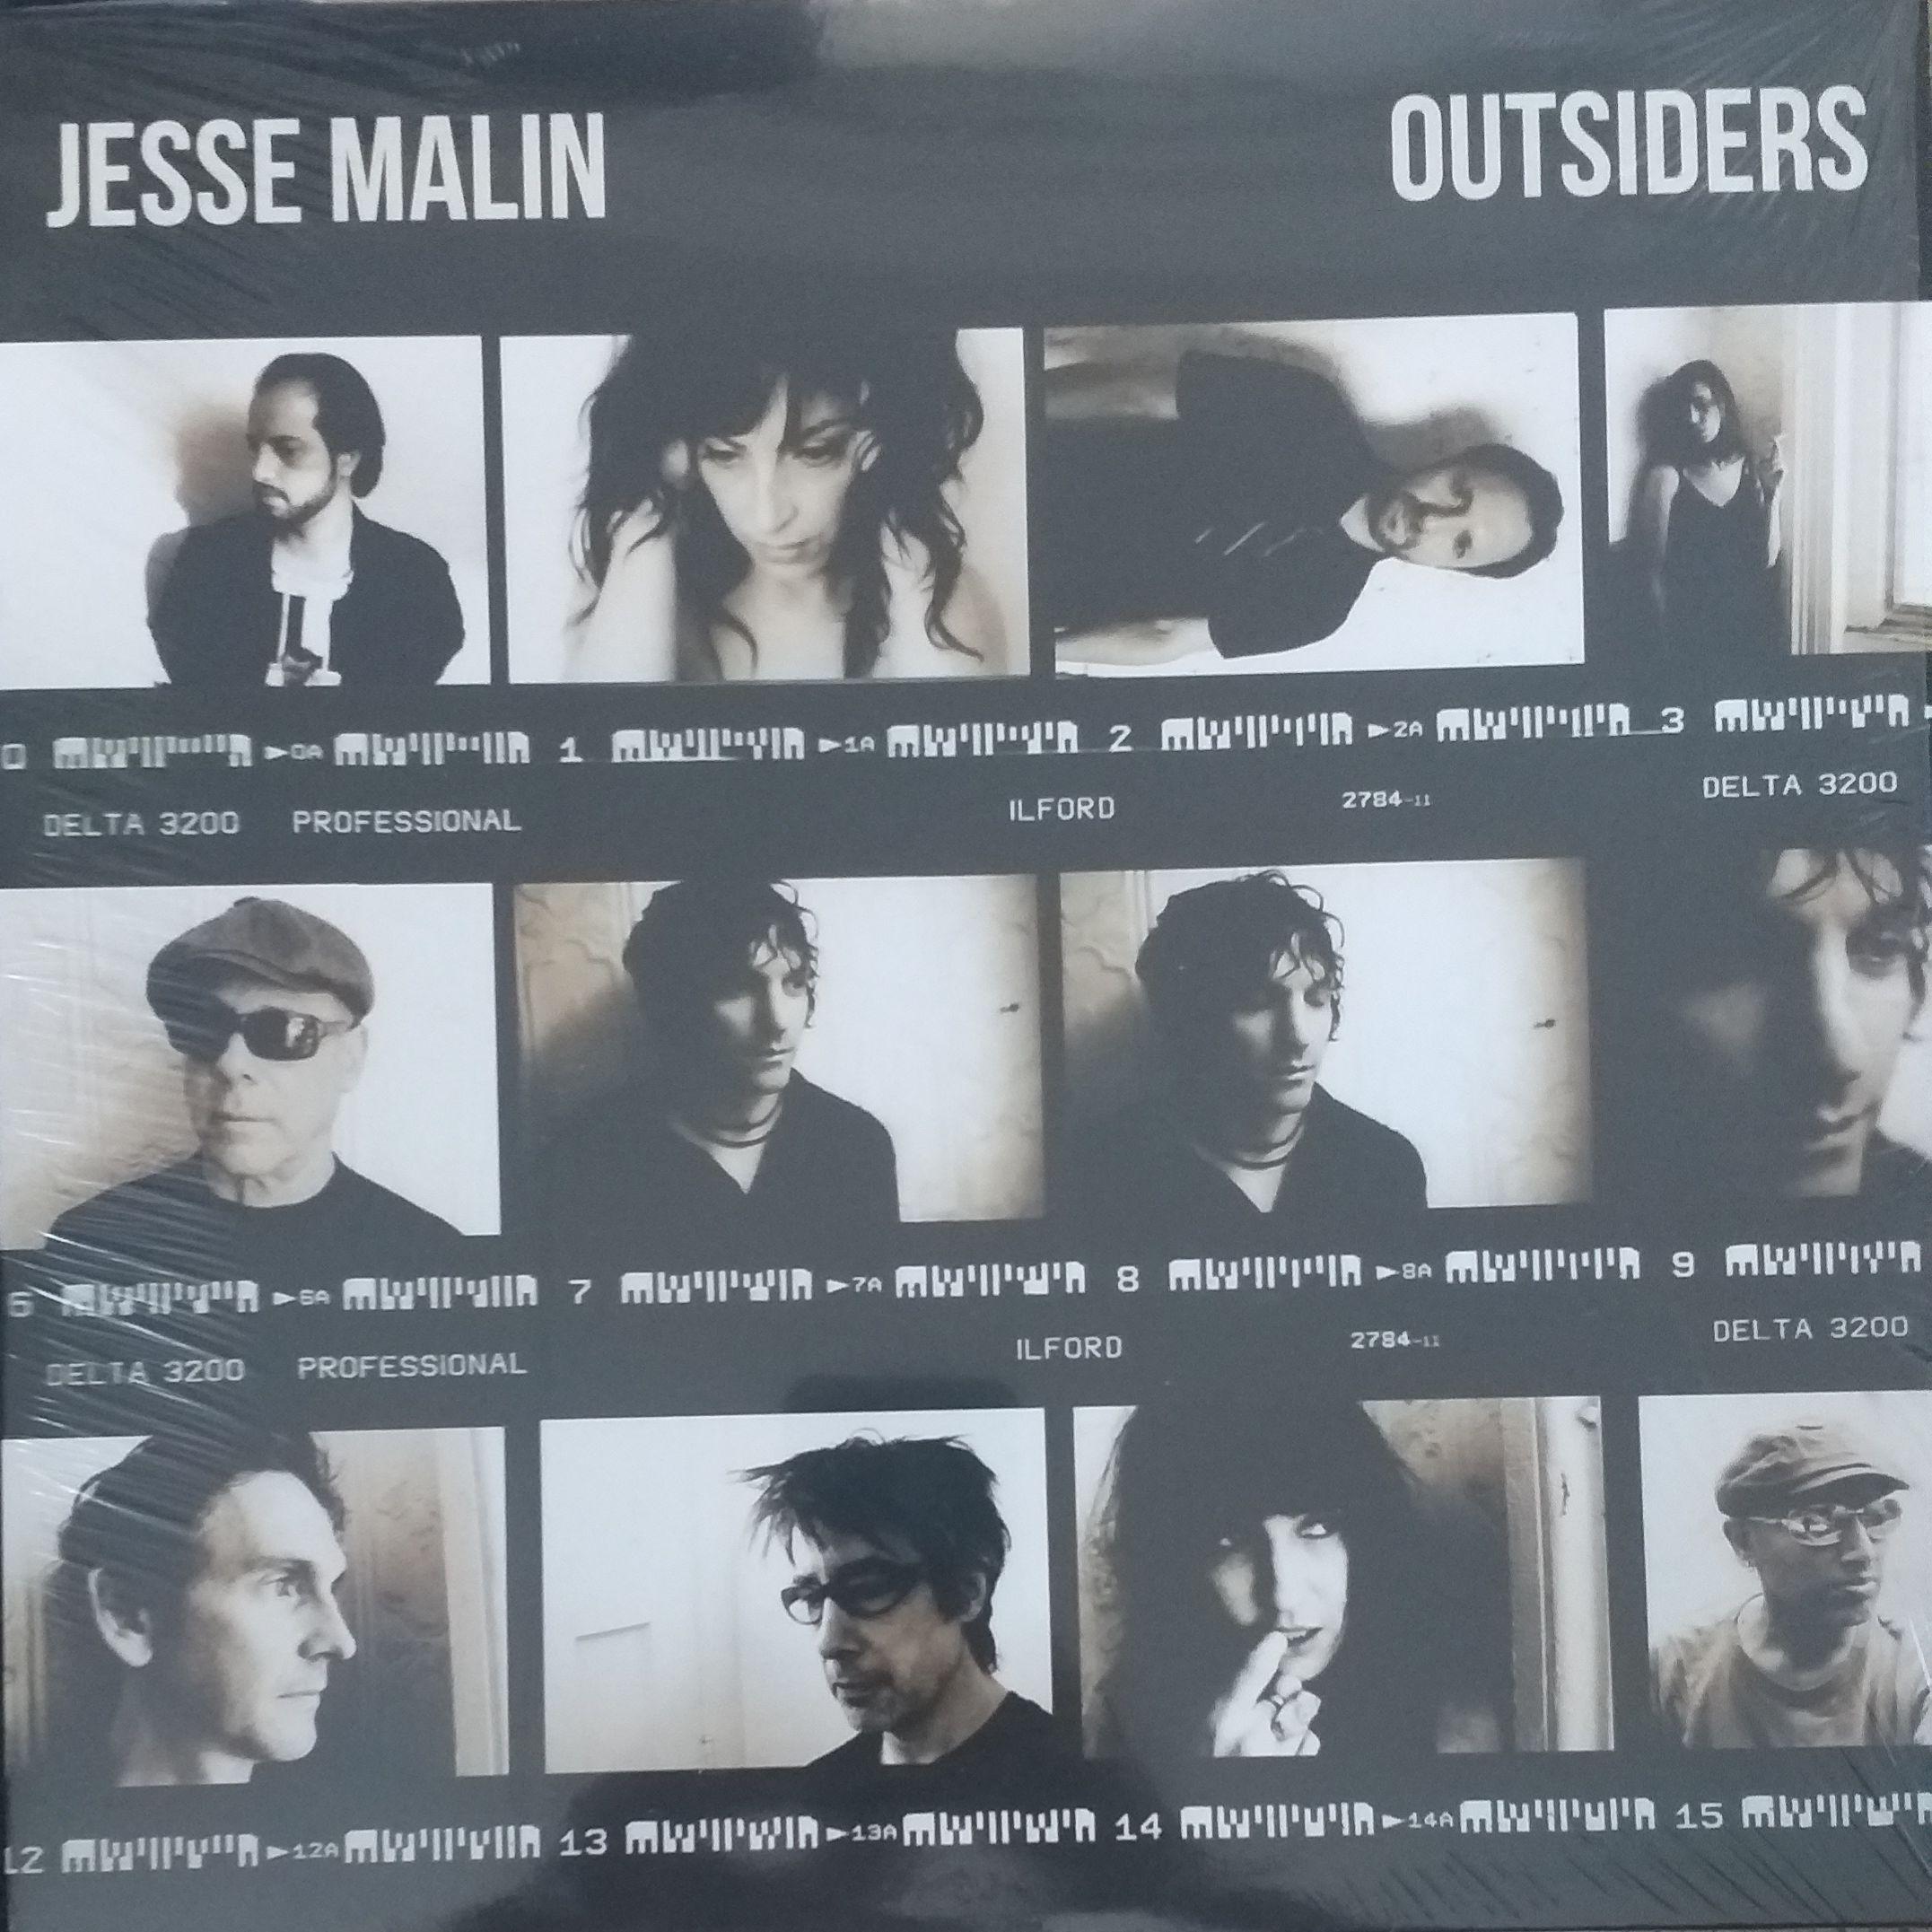 Jesse Malin Outsiders LP undefined